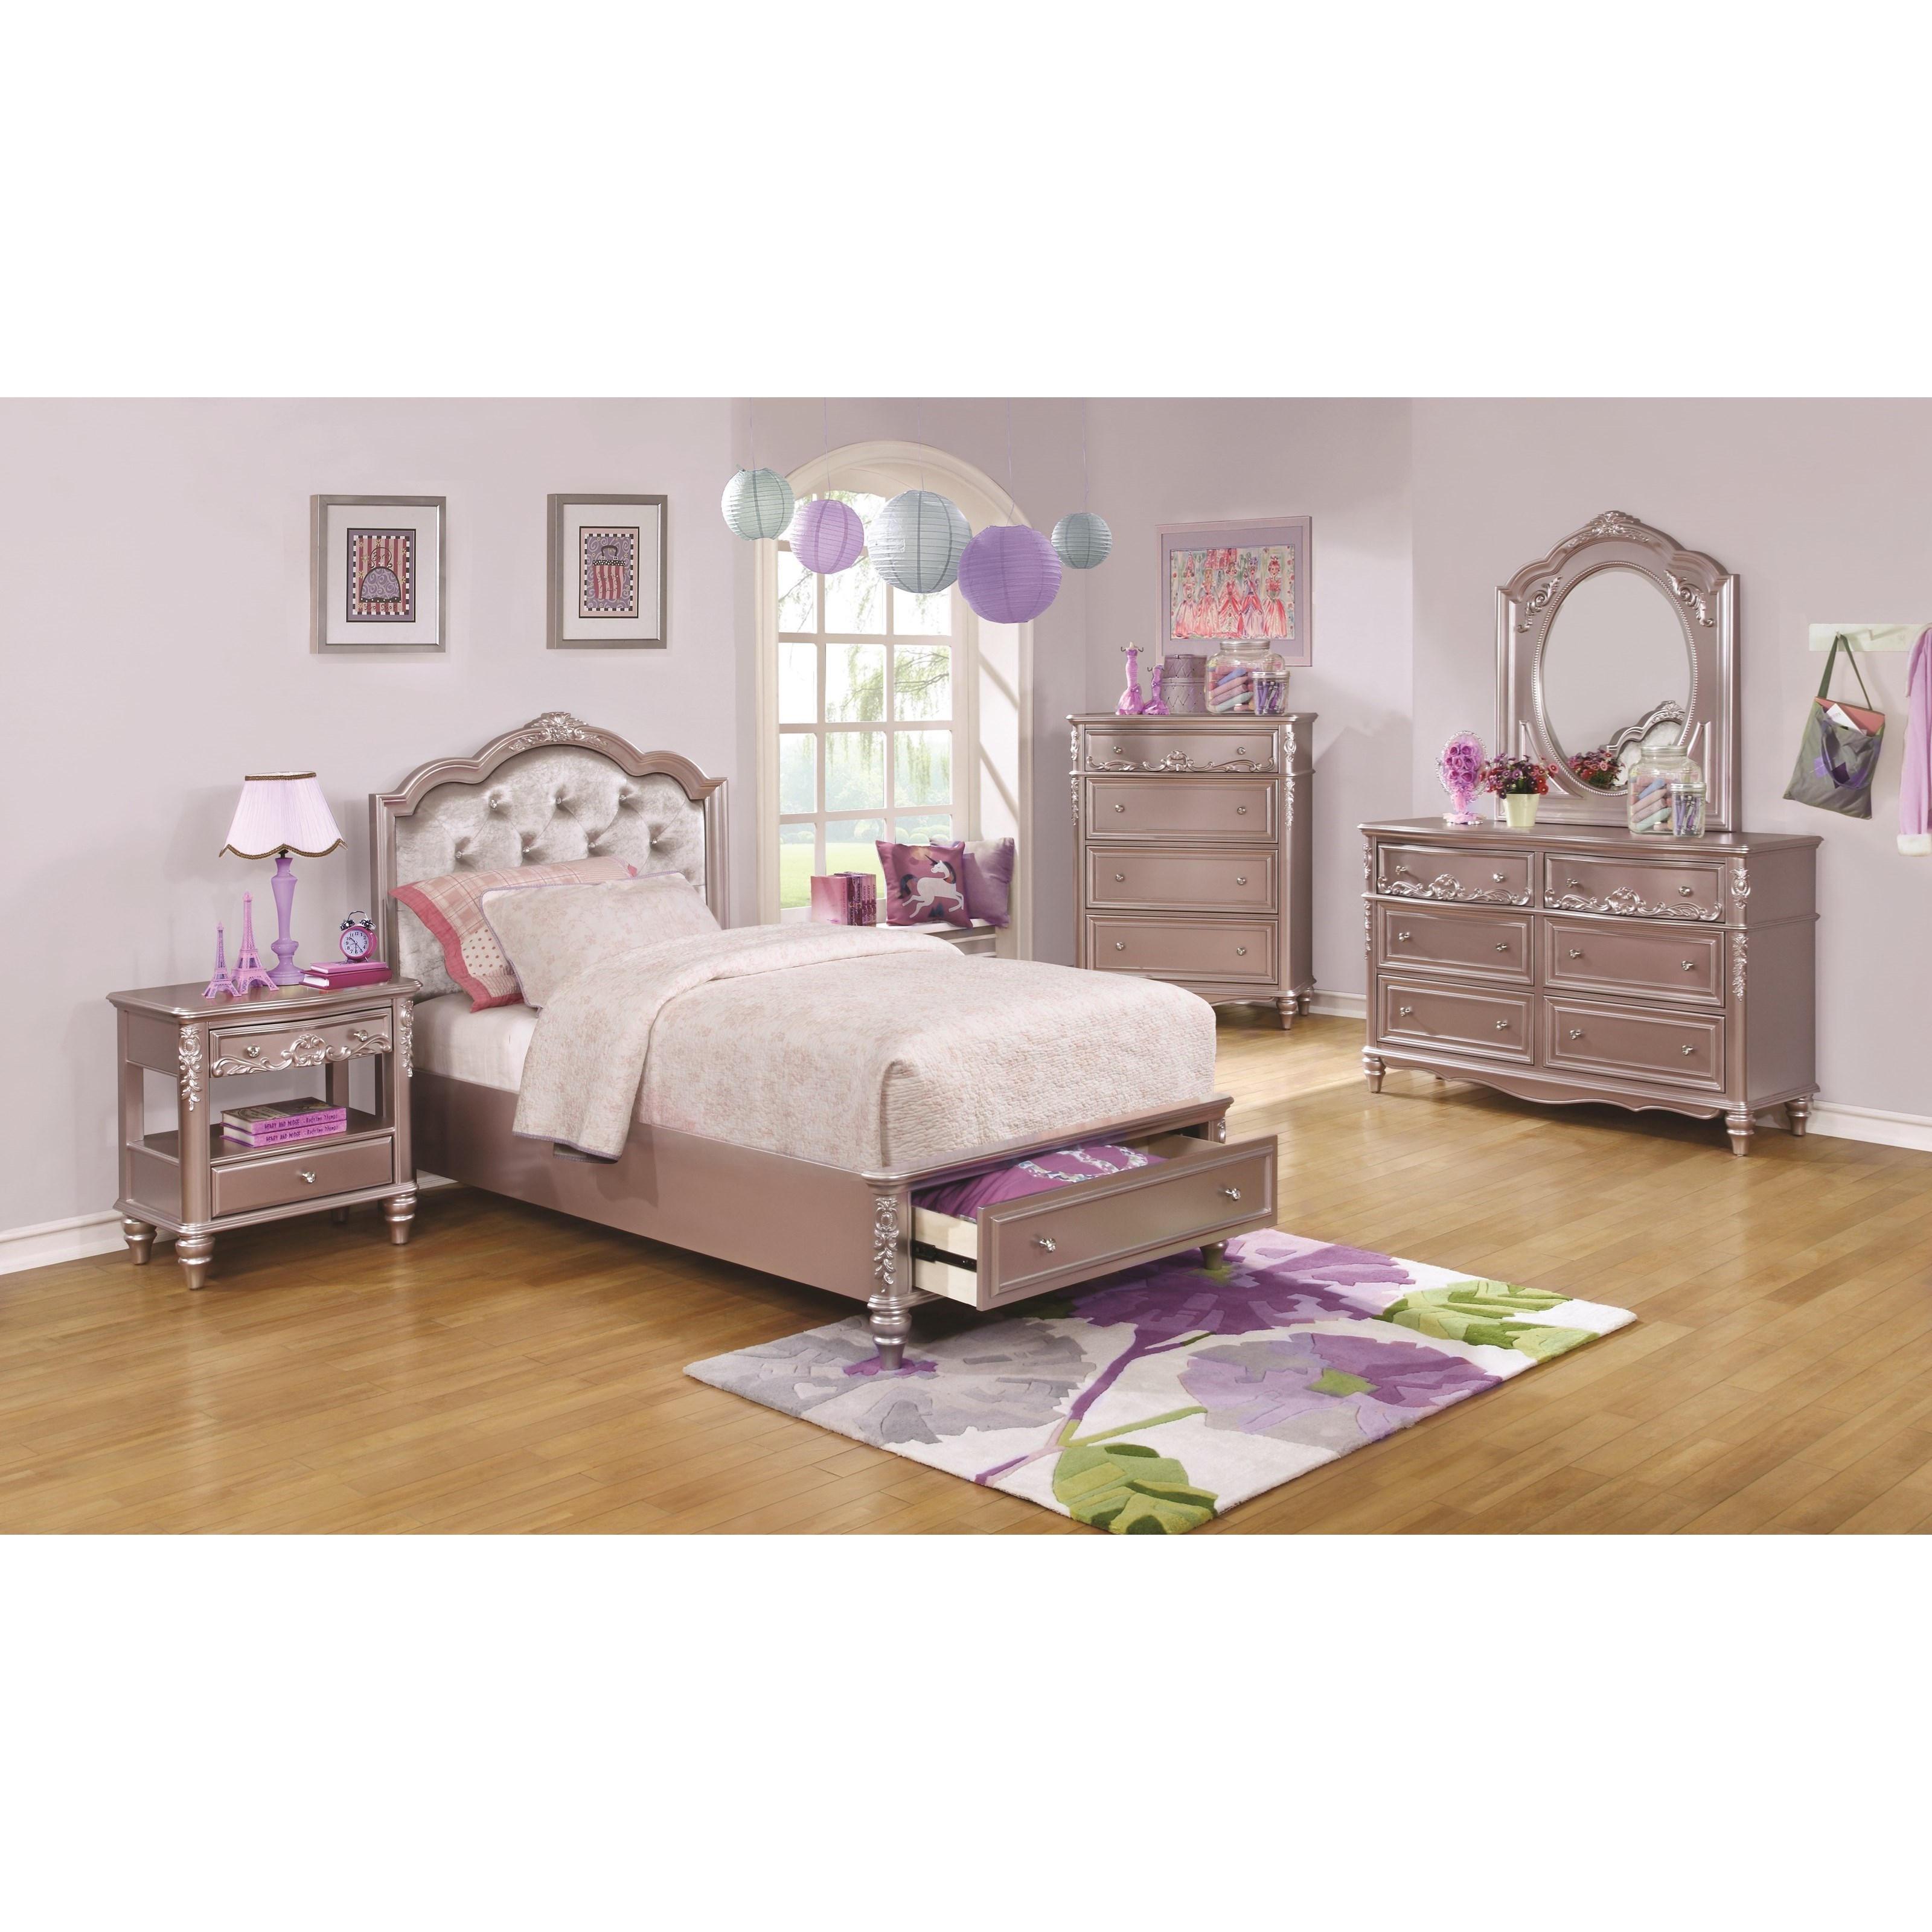 Caroline Twin Size Bed And Diamond Tufted Headboard